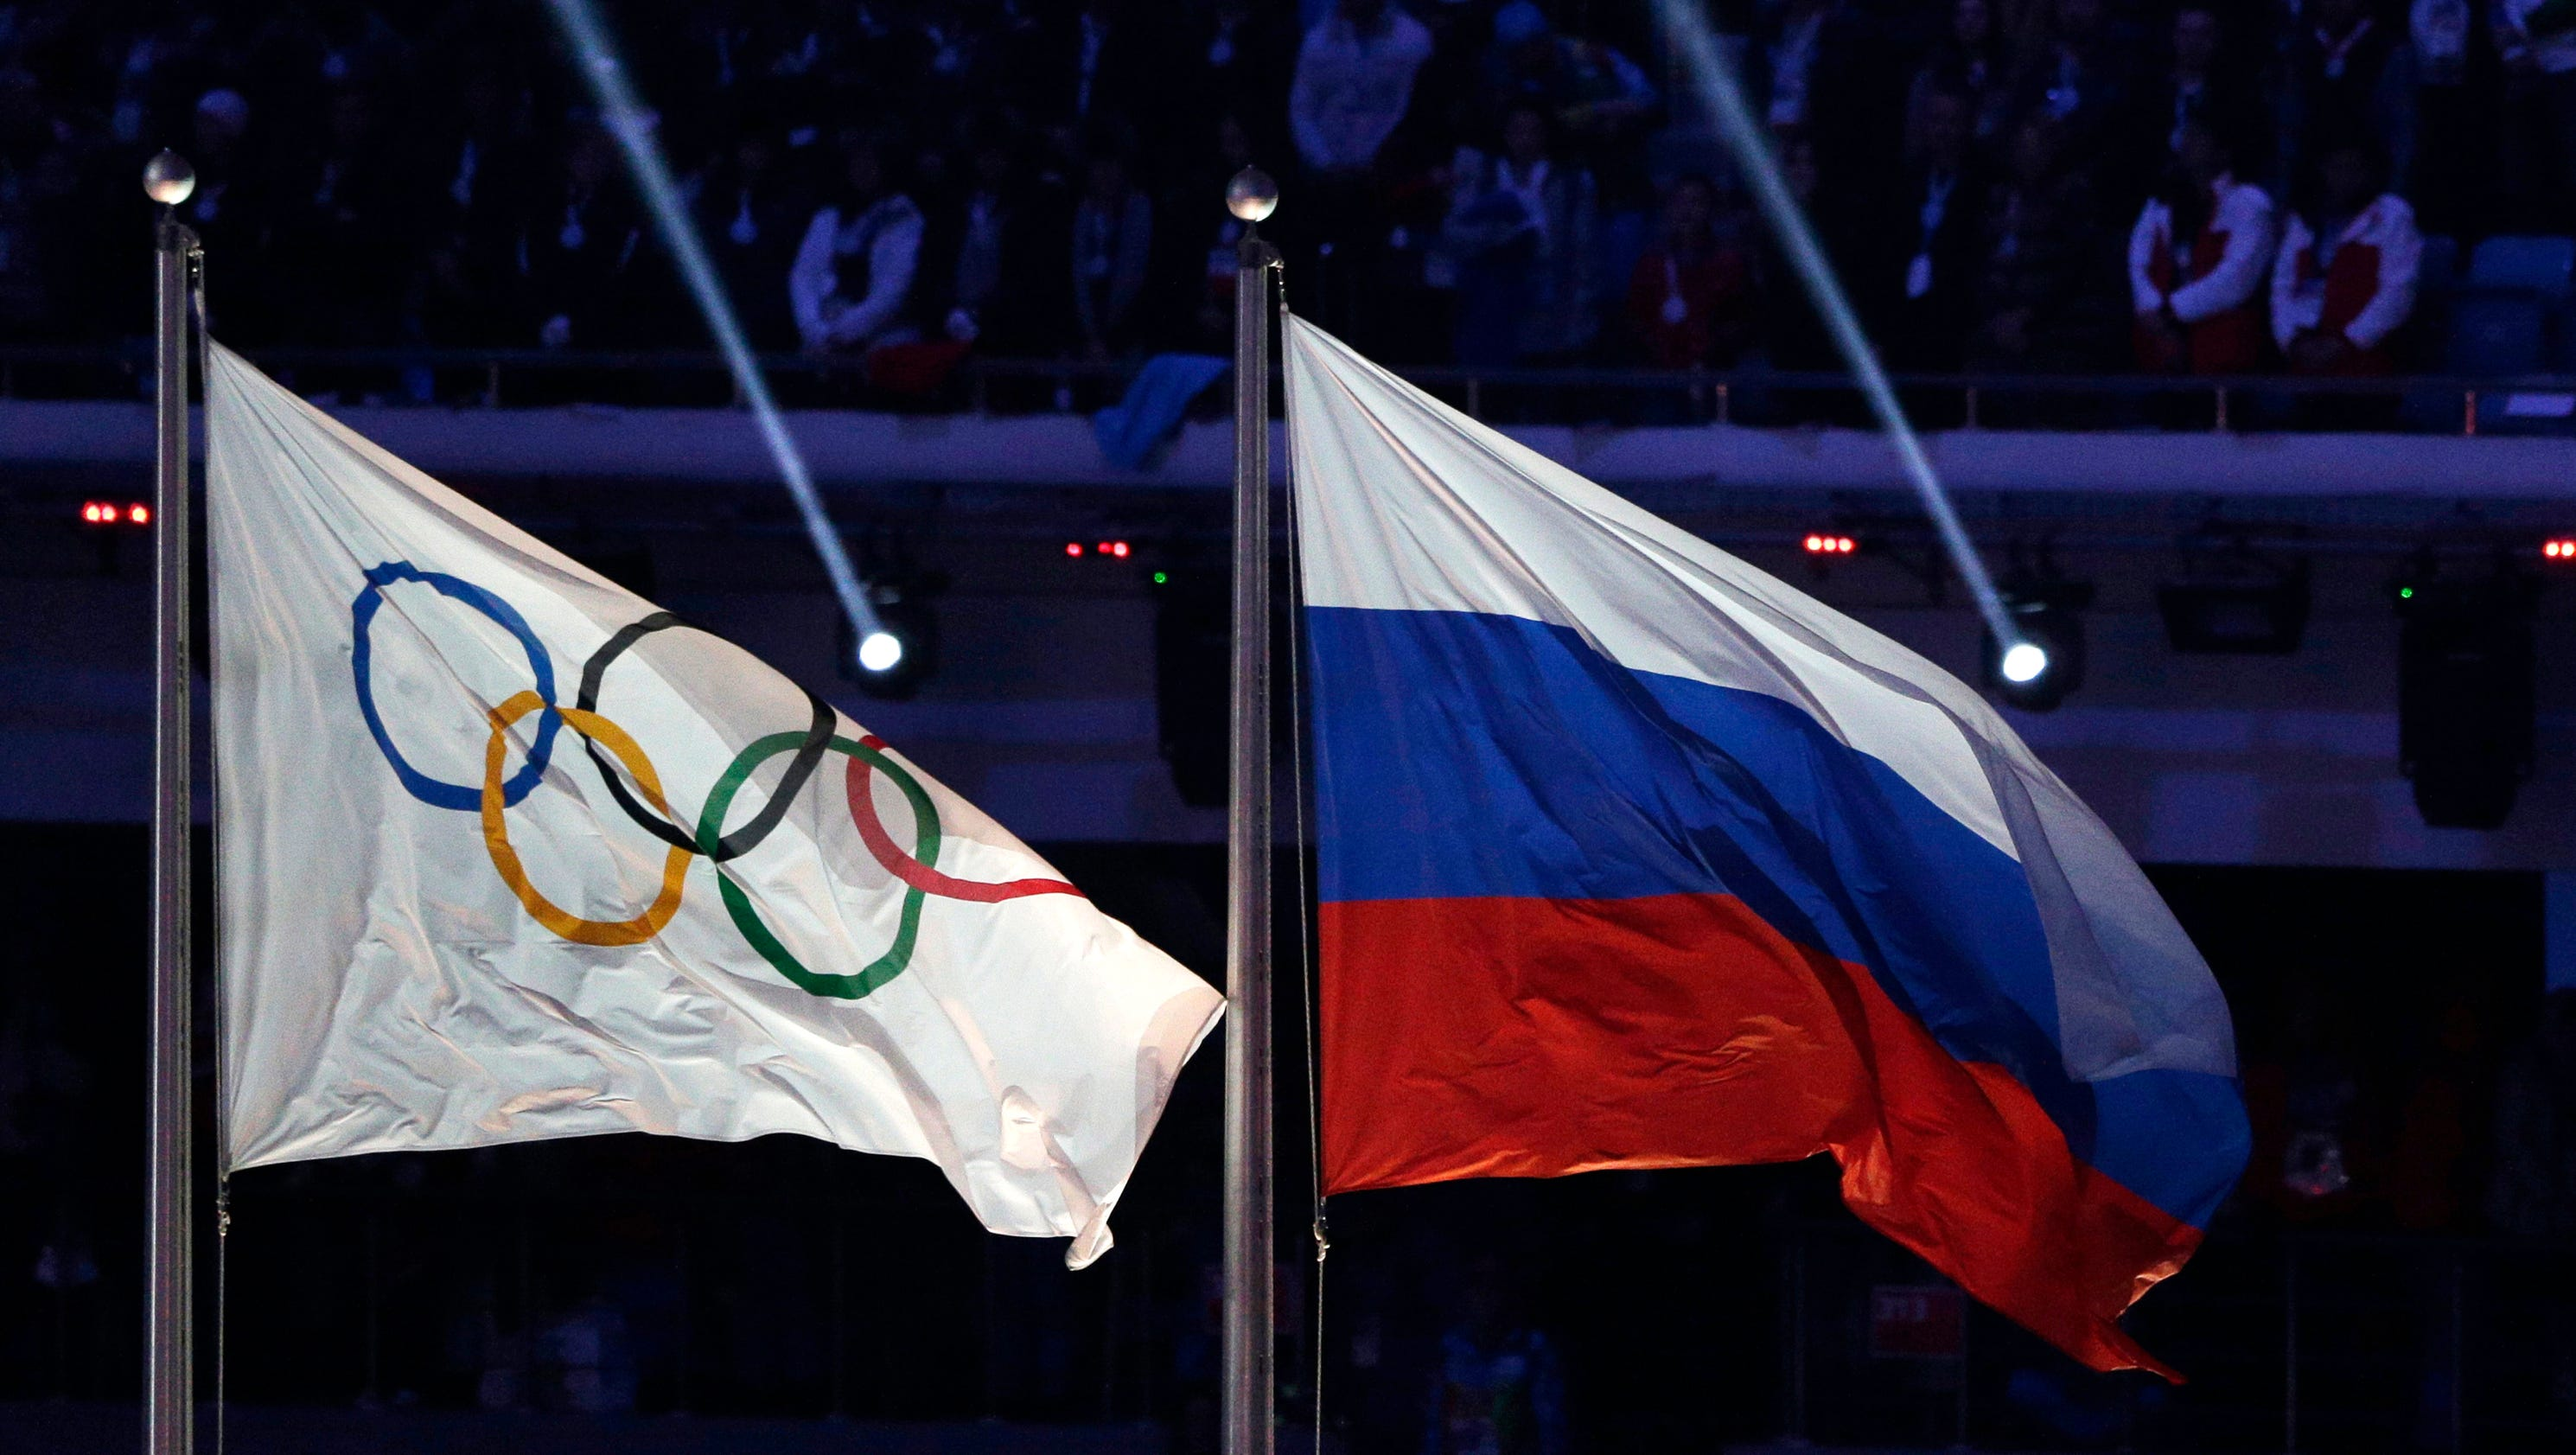 636463675660991419-ap-ioc-russia-doping-94692553